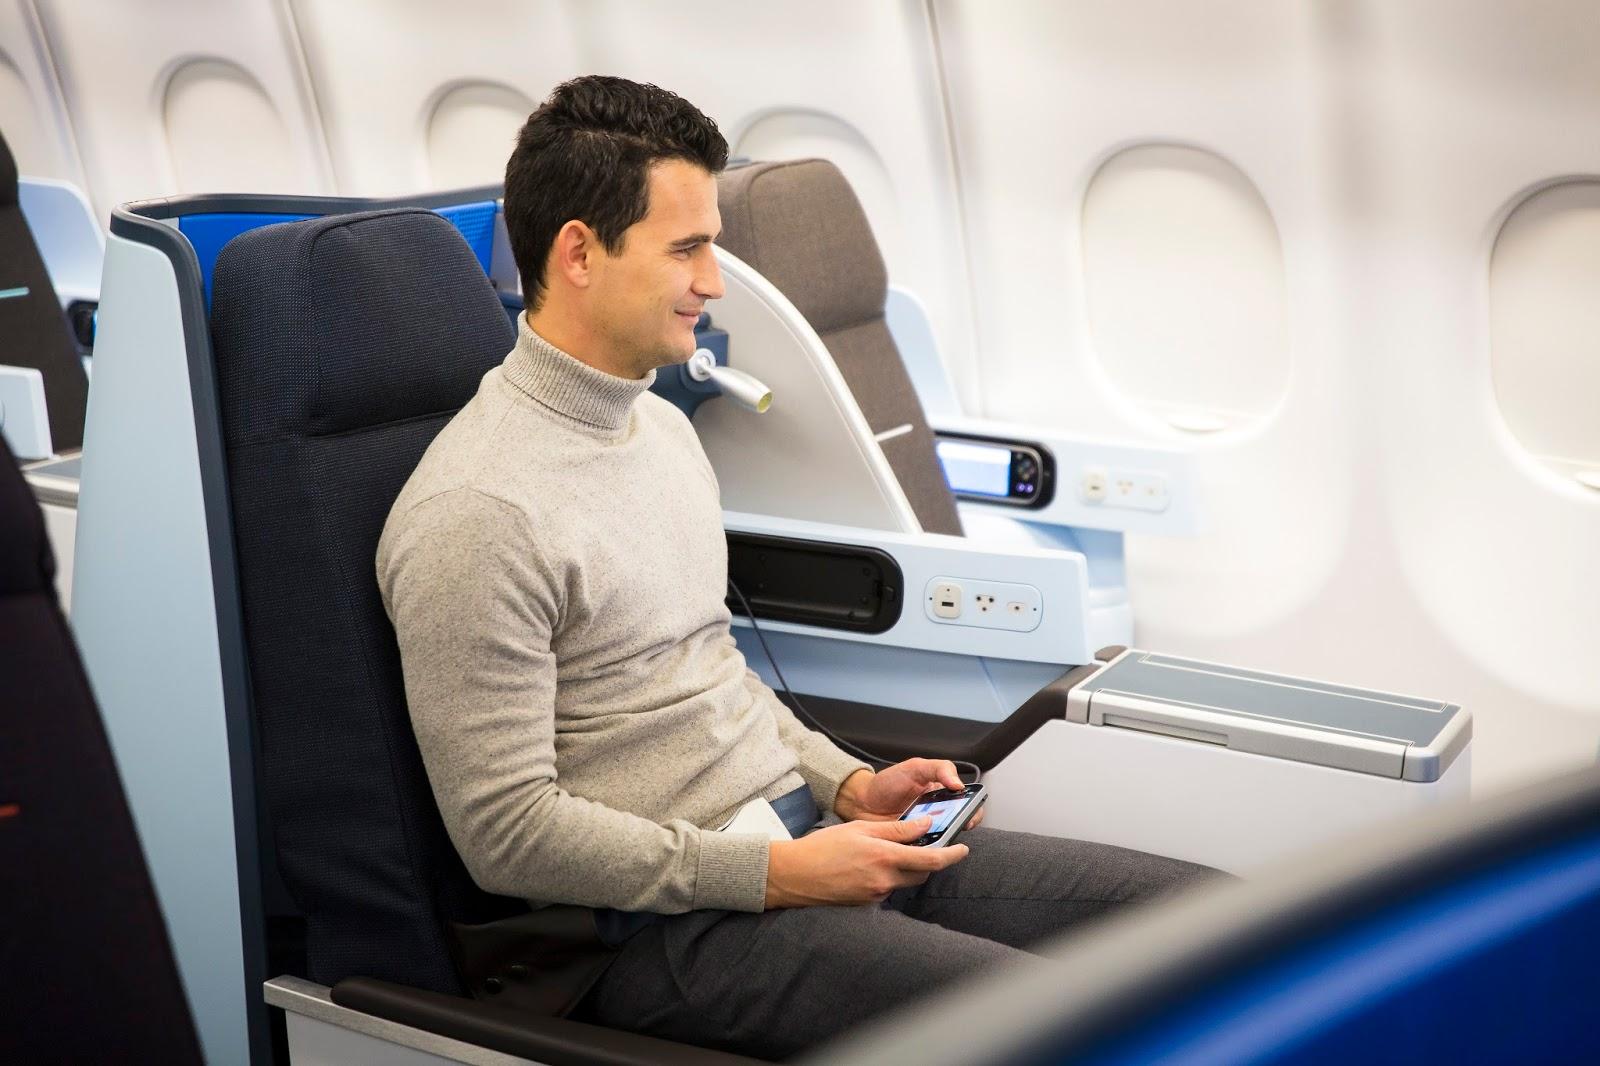 Luxo simples assim nova cabine business na rota amsterd for Migliori cabine business class 2017